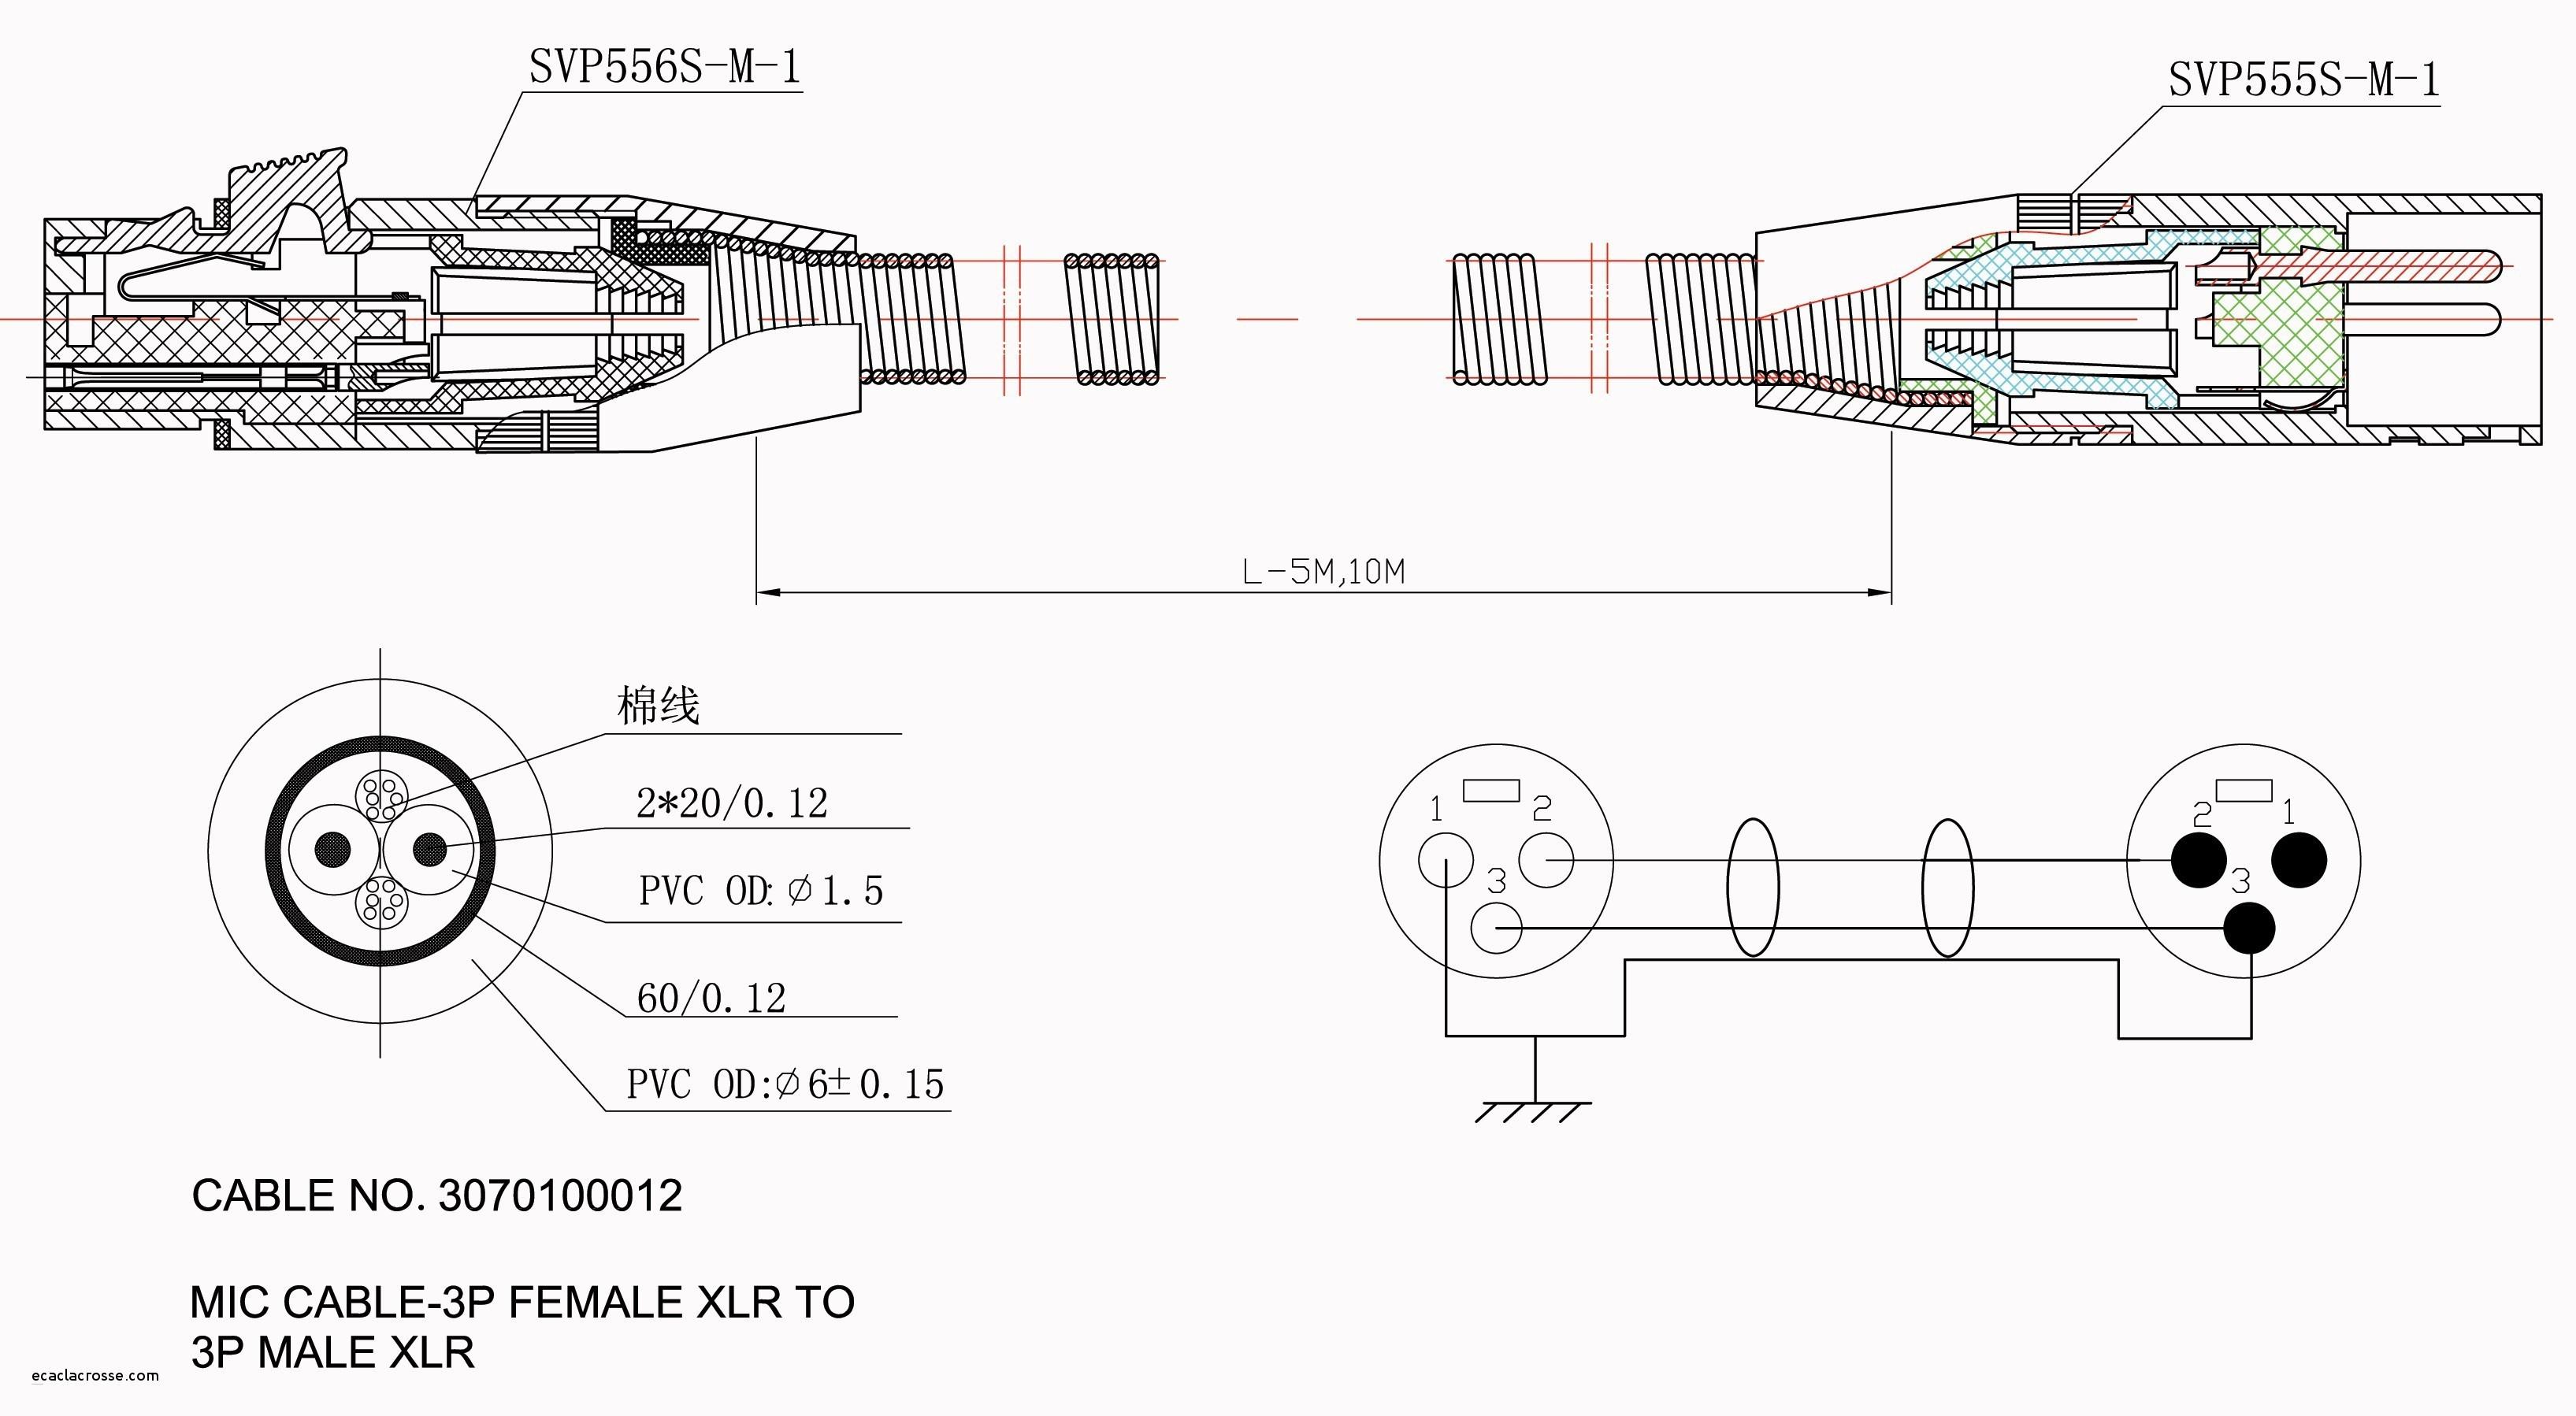 Car Engine Diagram Pdf Rj45 Wiring Diagram Pdf Experts Wiring Diagram • Of Car Engine Diagram Pdf